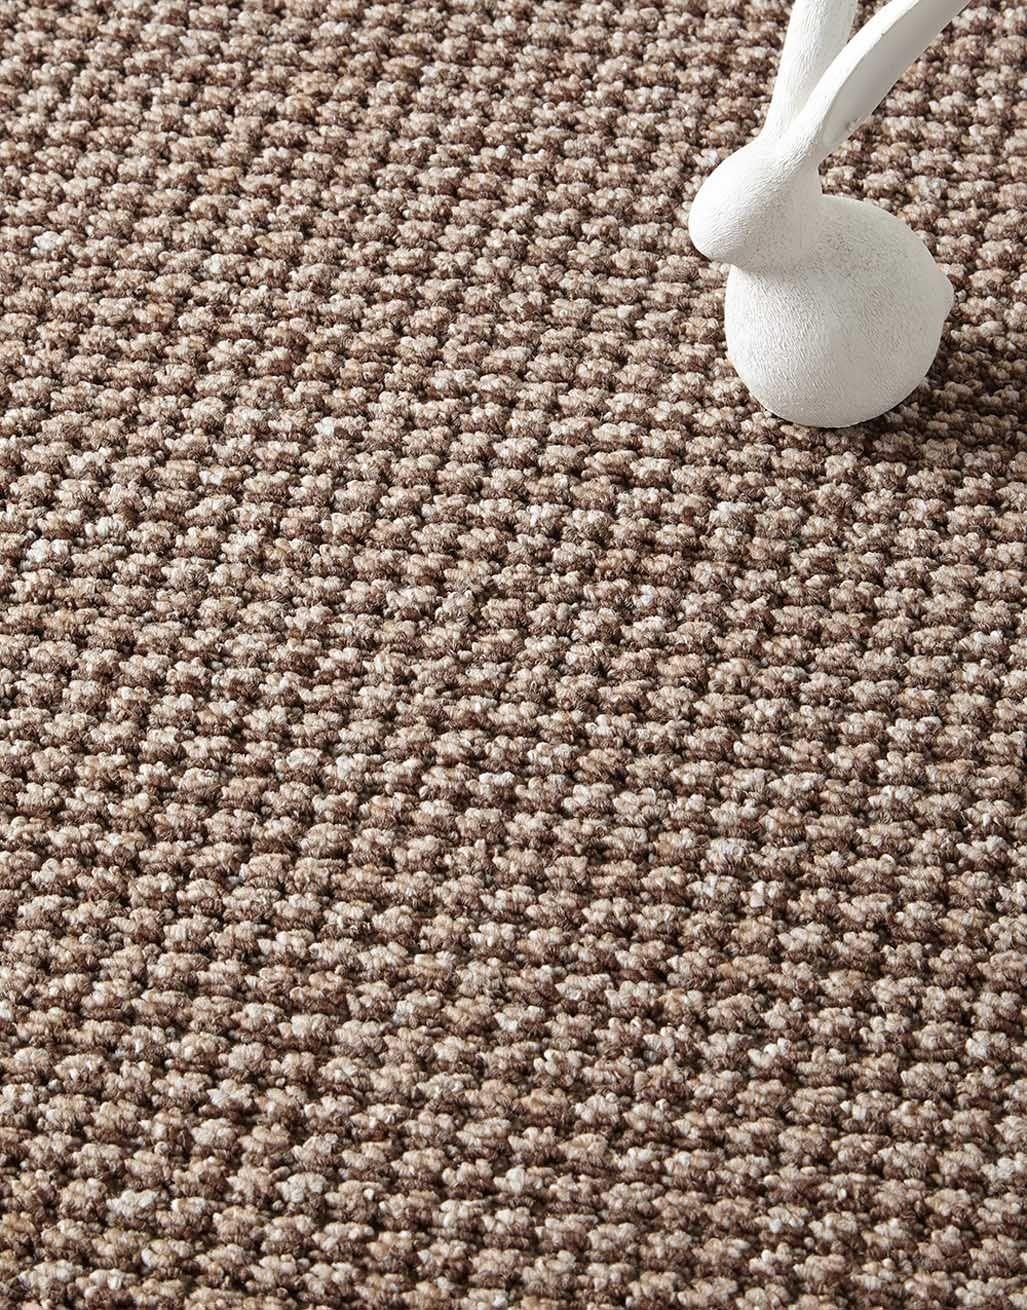 Olympia - Berber, Flooring Superstore #FlooringSuperstore #EngineeredWoodFlooring #EngineeredWood #SolidWood #SolidWoodFlooring